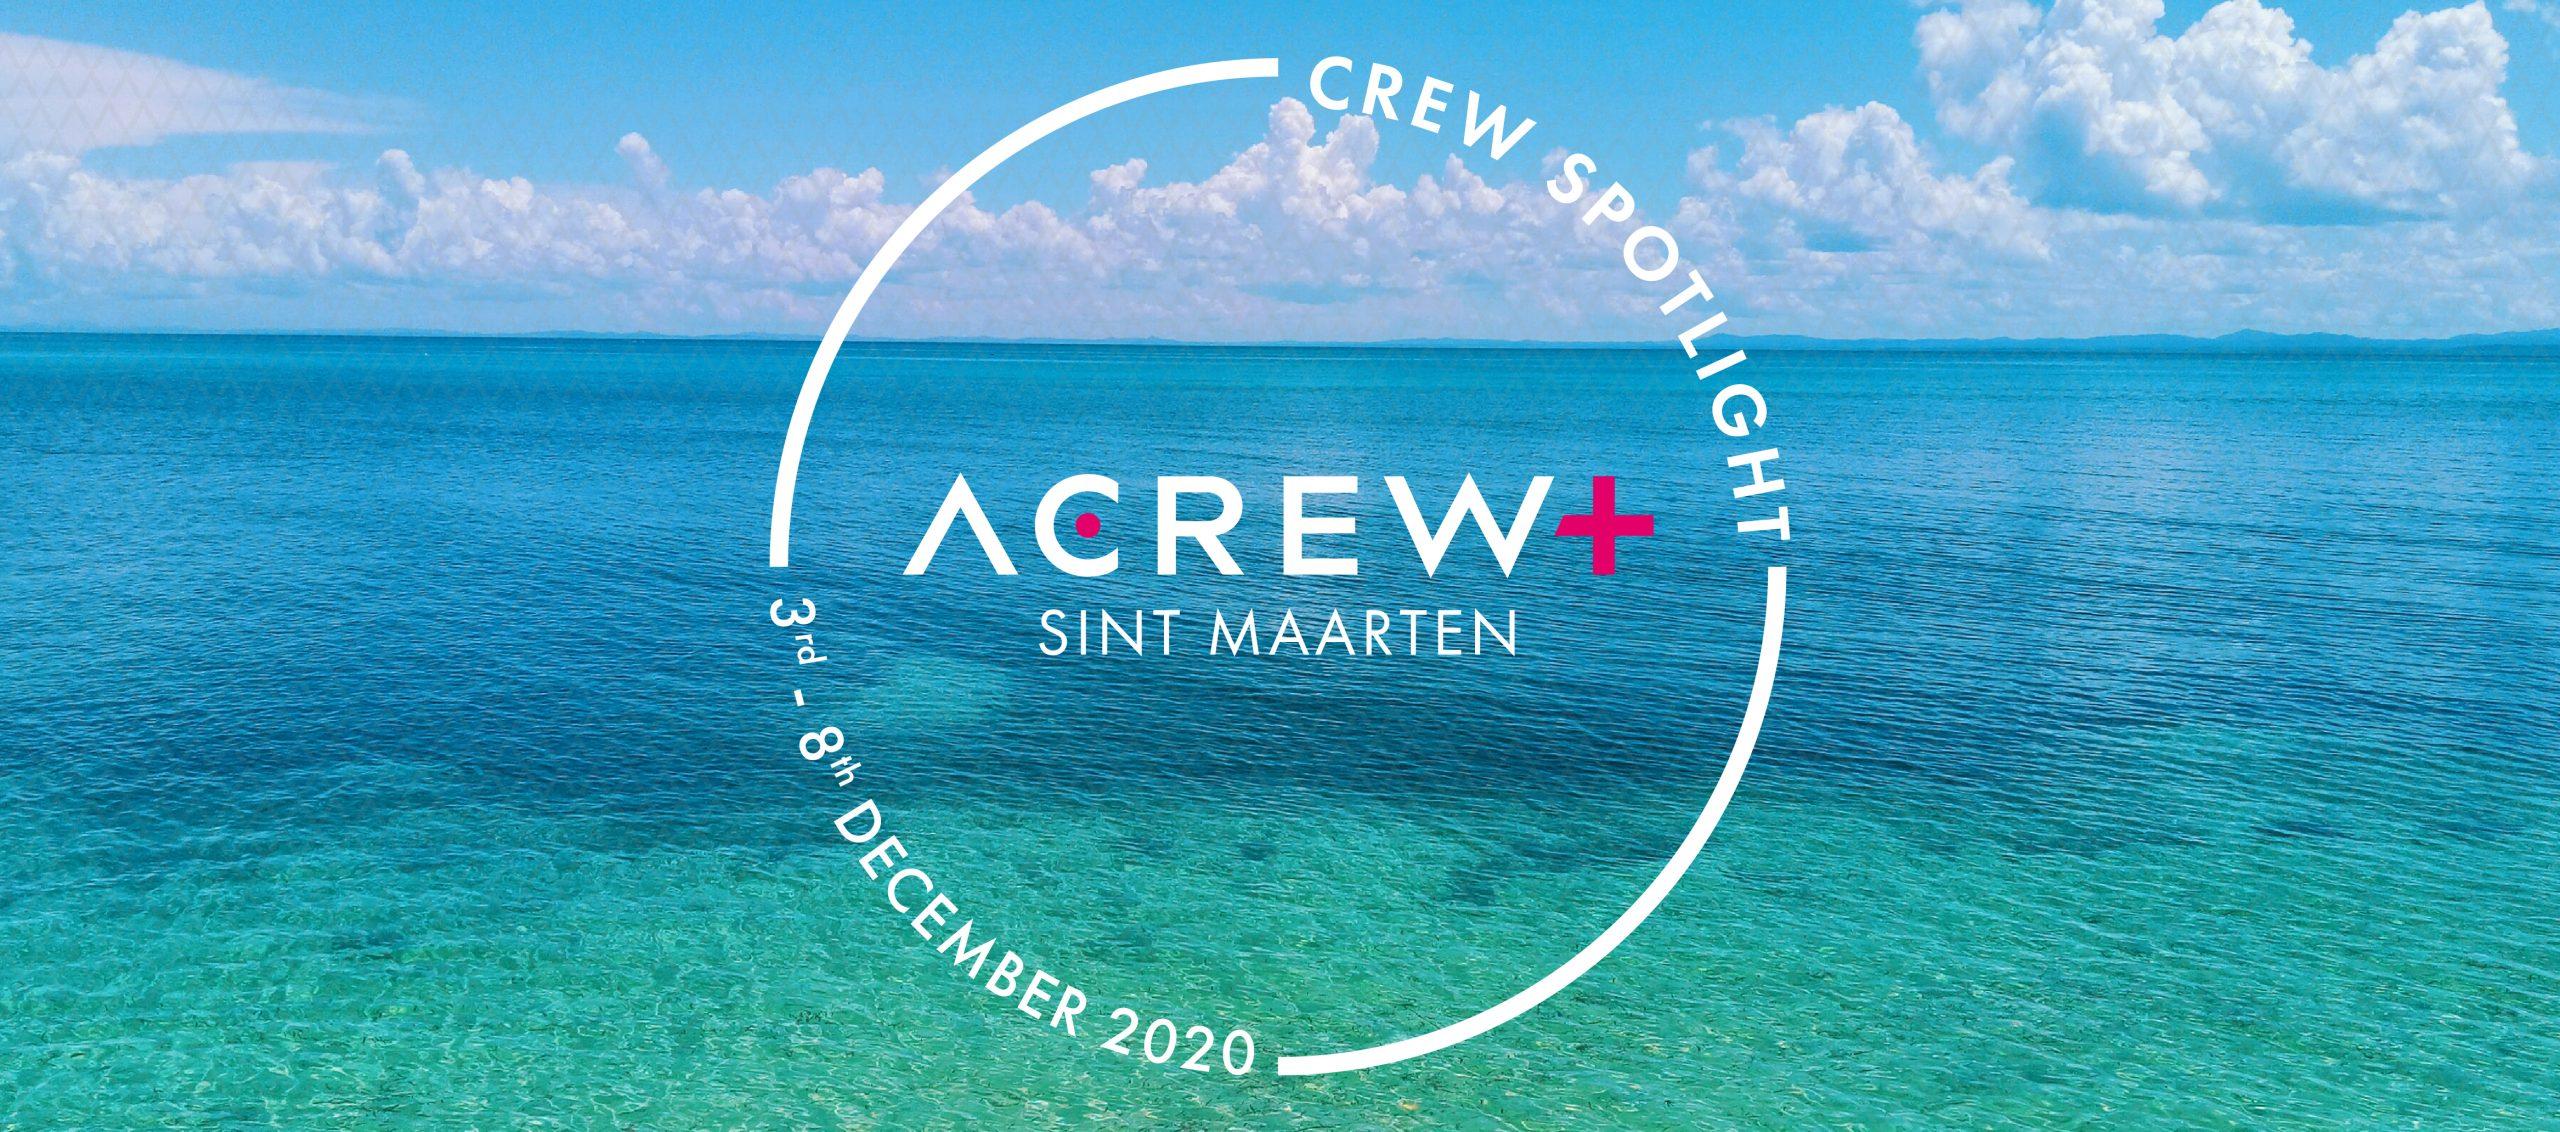 Crew Spotlight